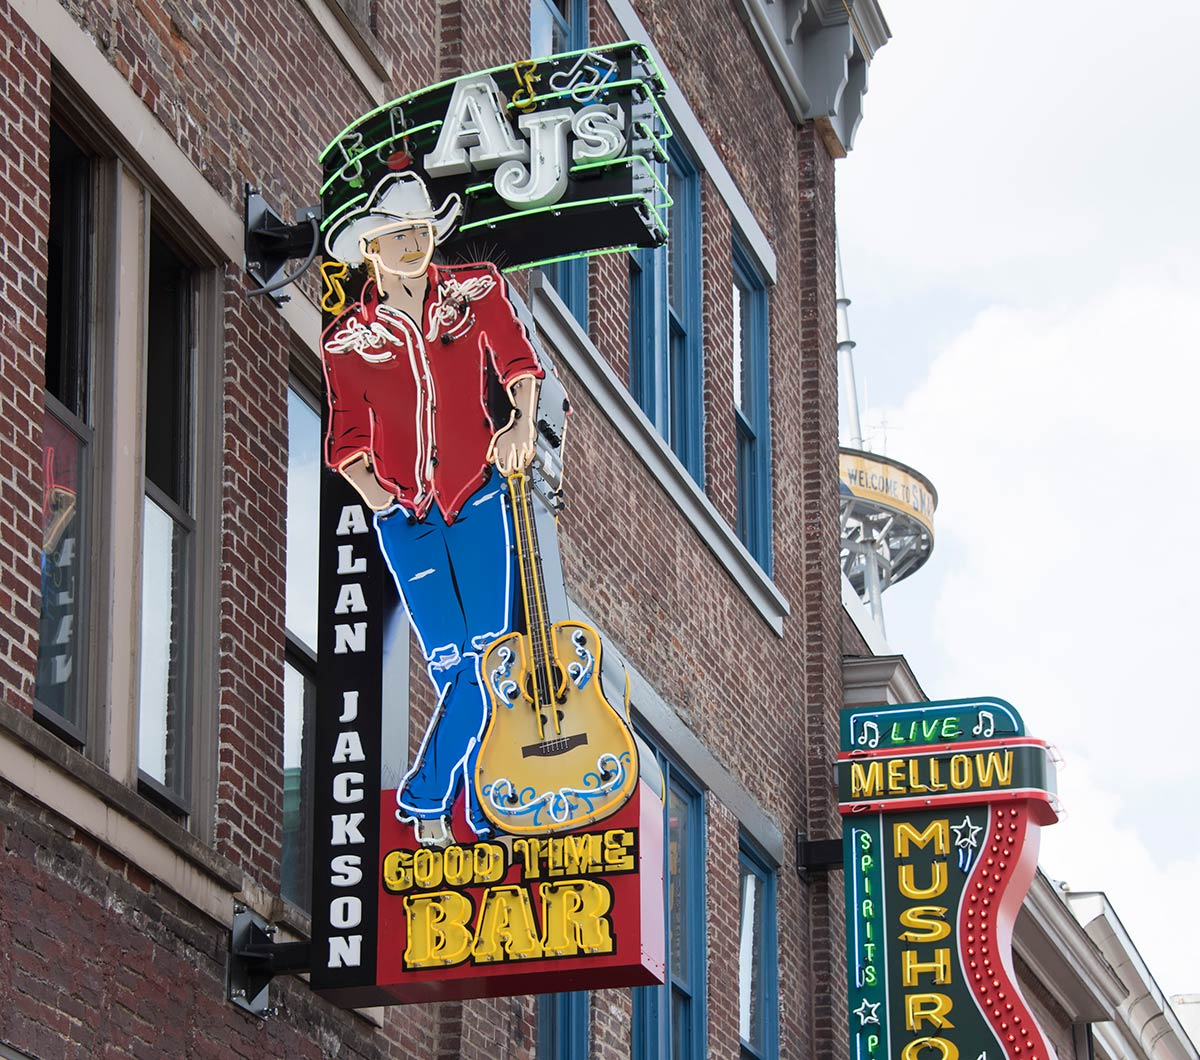 AJ's Good Time Bar